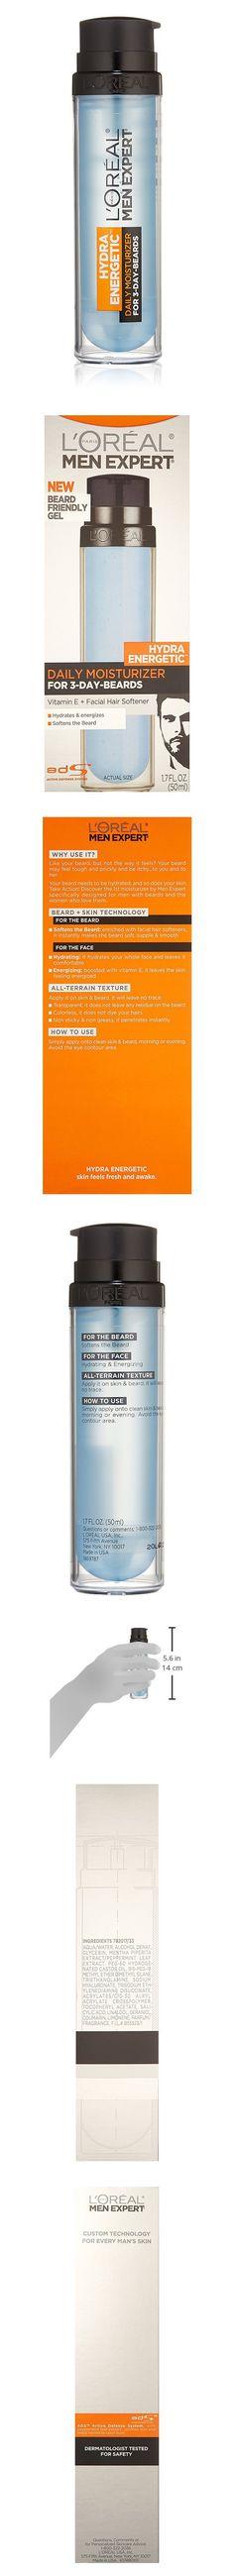 L'Oreal Paris Skin Care Men Expert Hydra Energetic 3 Day Beard Daily Moisturizer #beauty #lorealparis #electronics_features #electronics #lotions